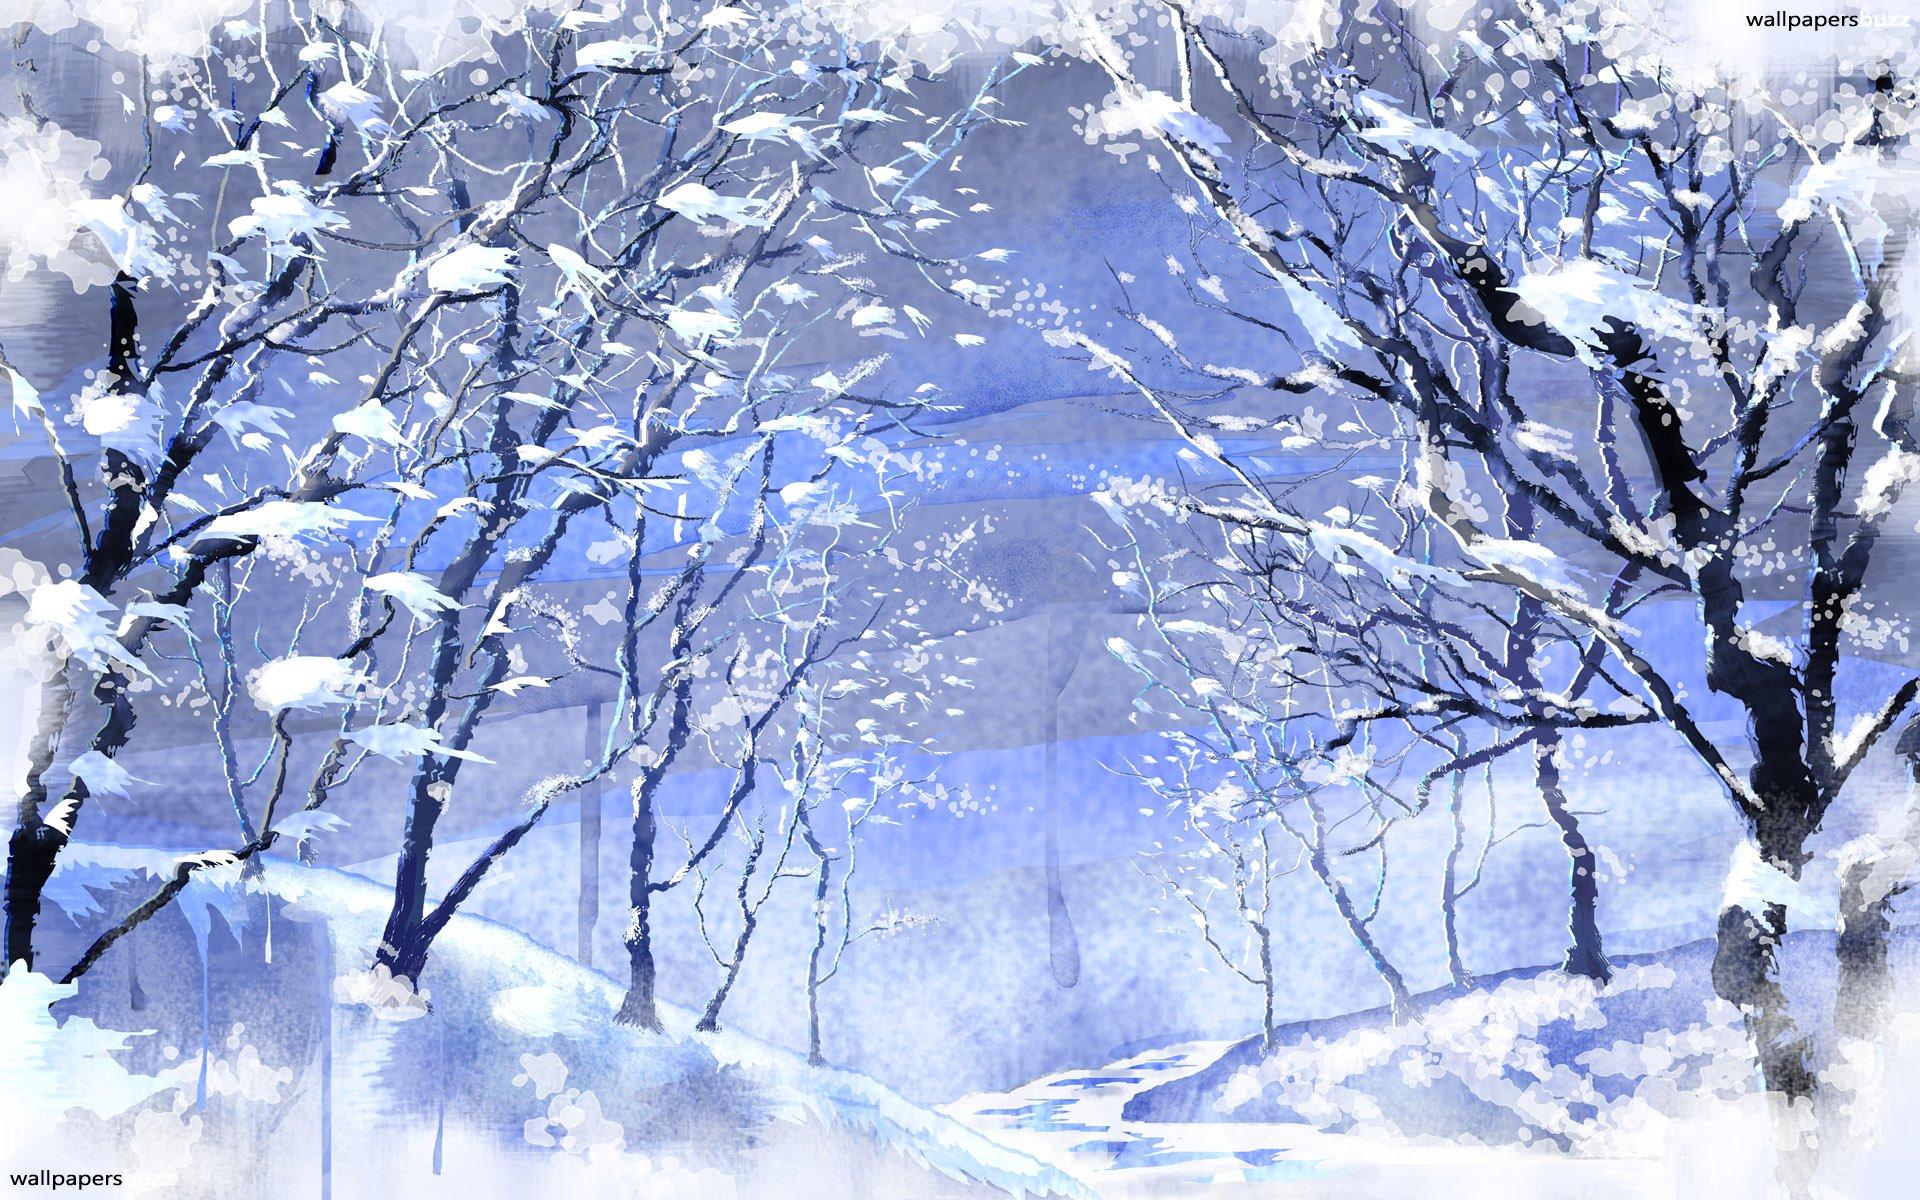 Amazing Wallpaper Love Winter - Winter-Snow-Wallpapers-044  Photograph_483533.jpg